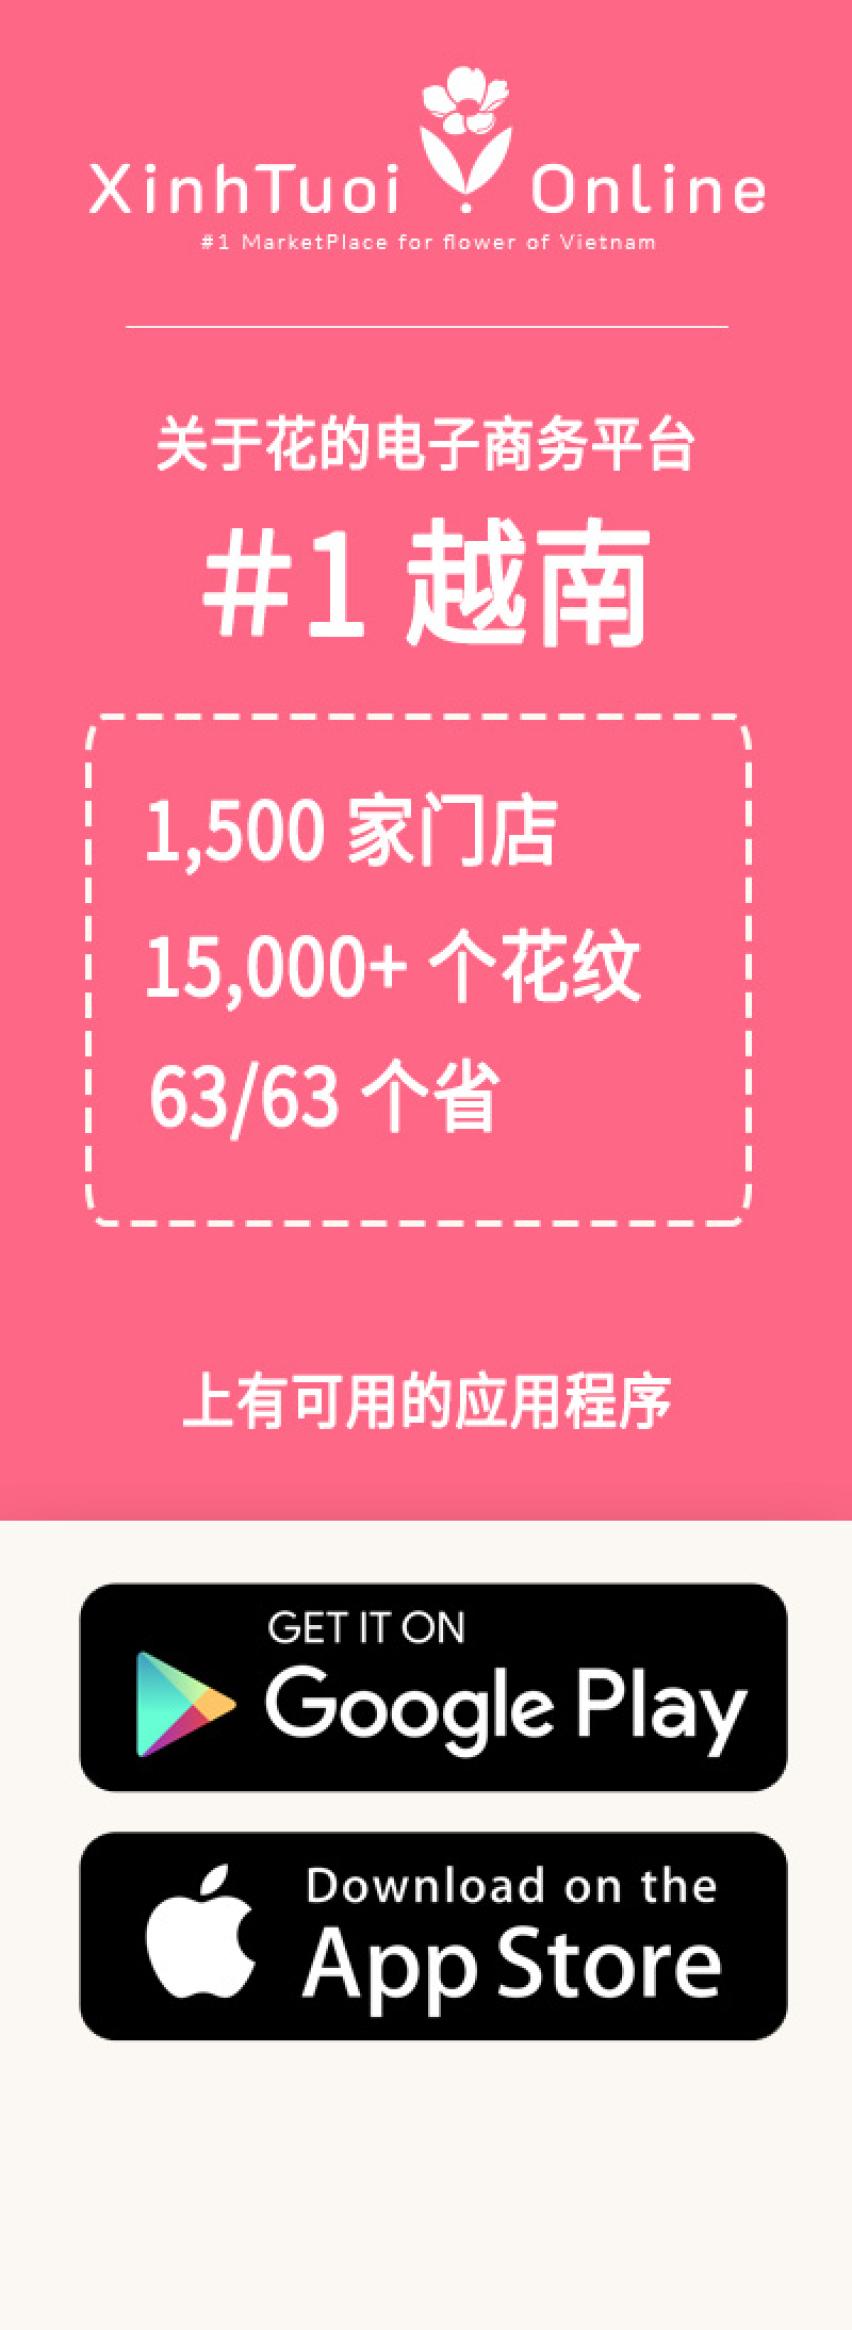 Xinh Tuoi Online-关于越南#1花卉的电子商务平台